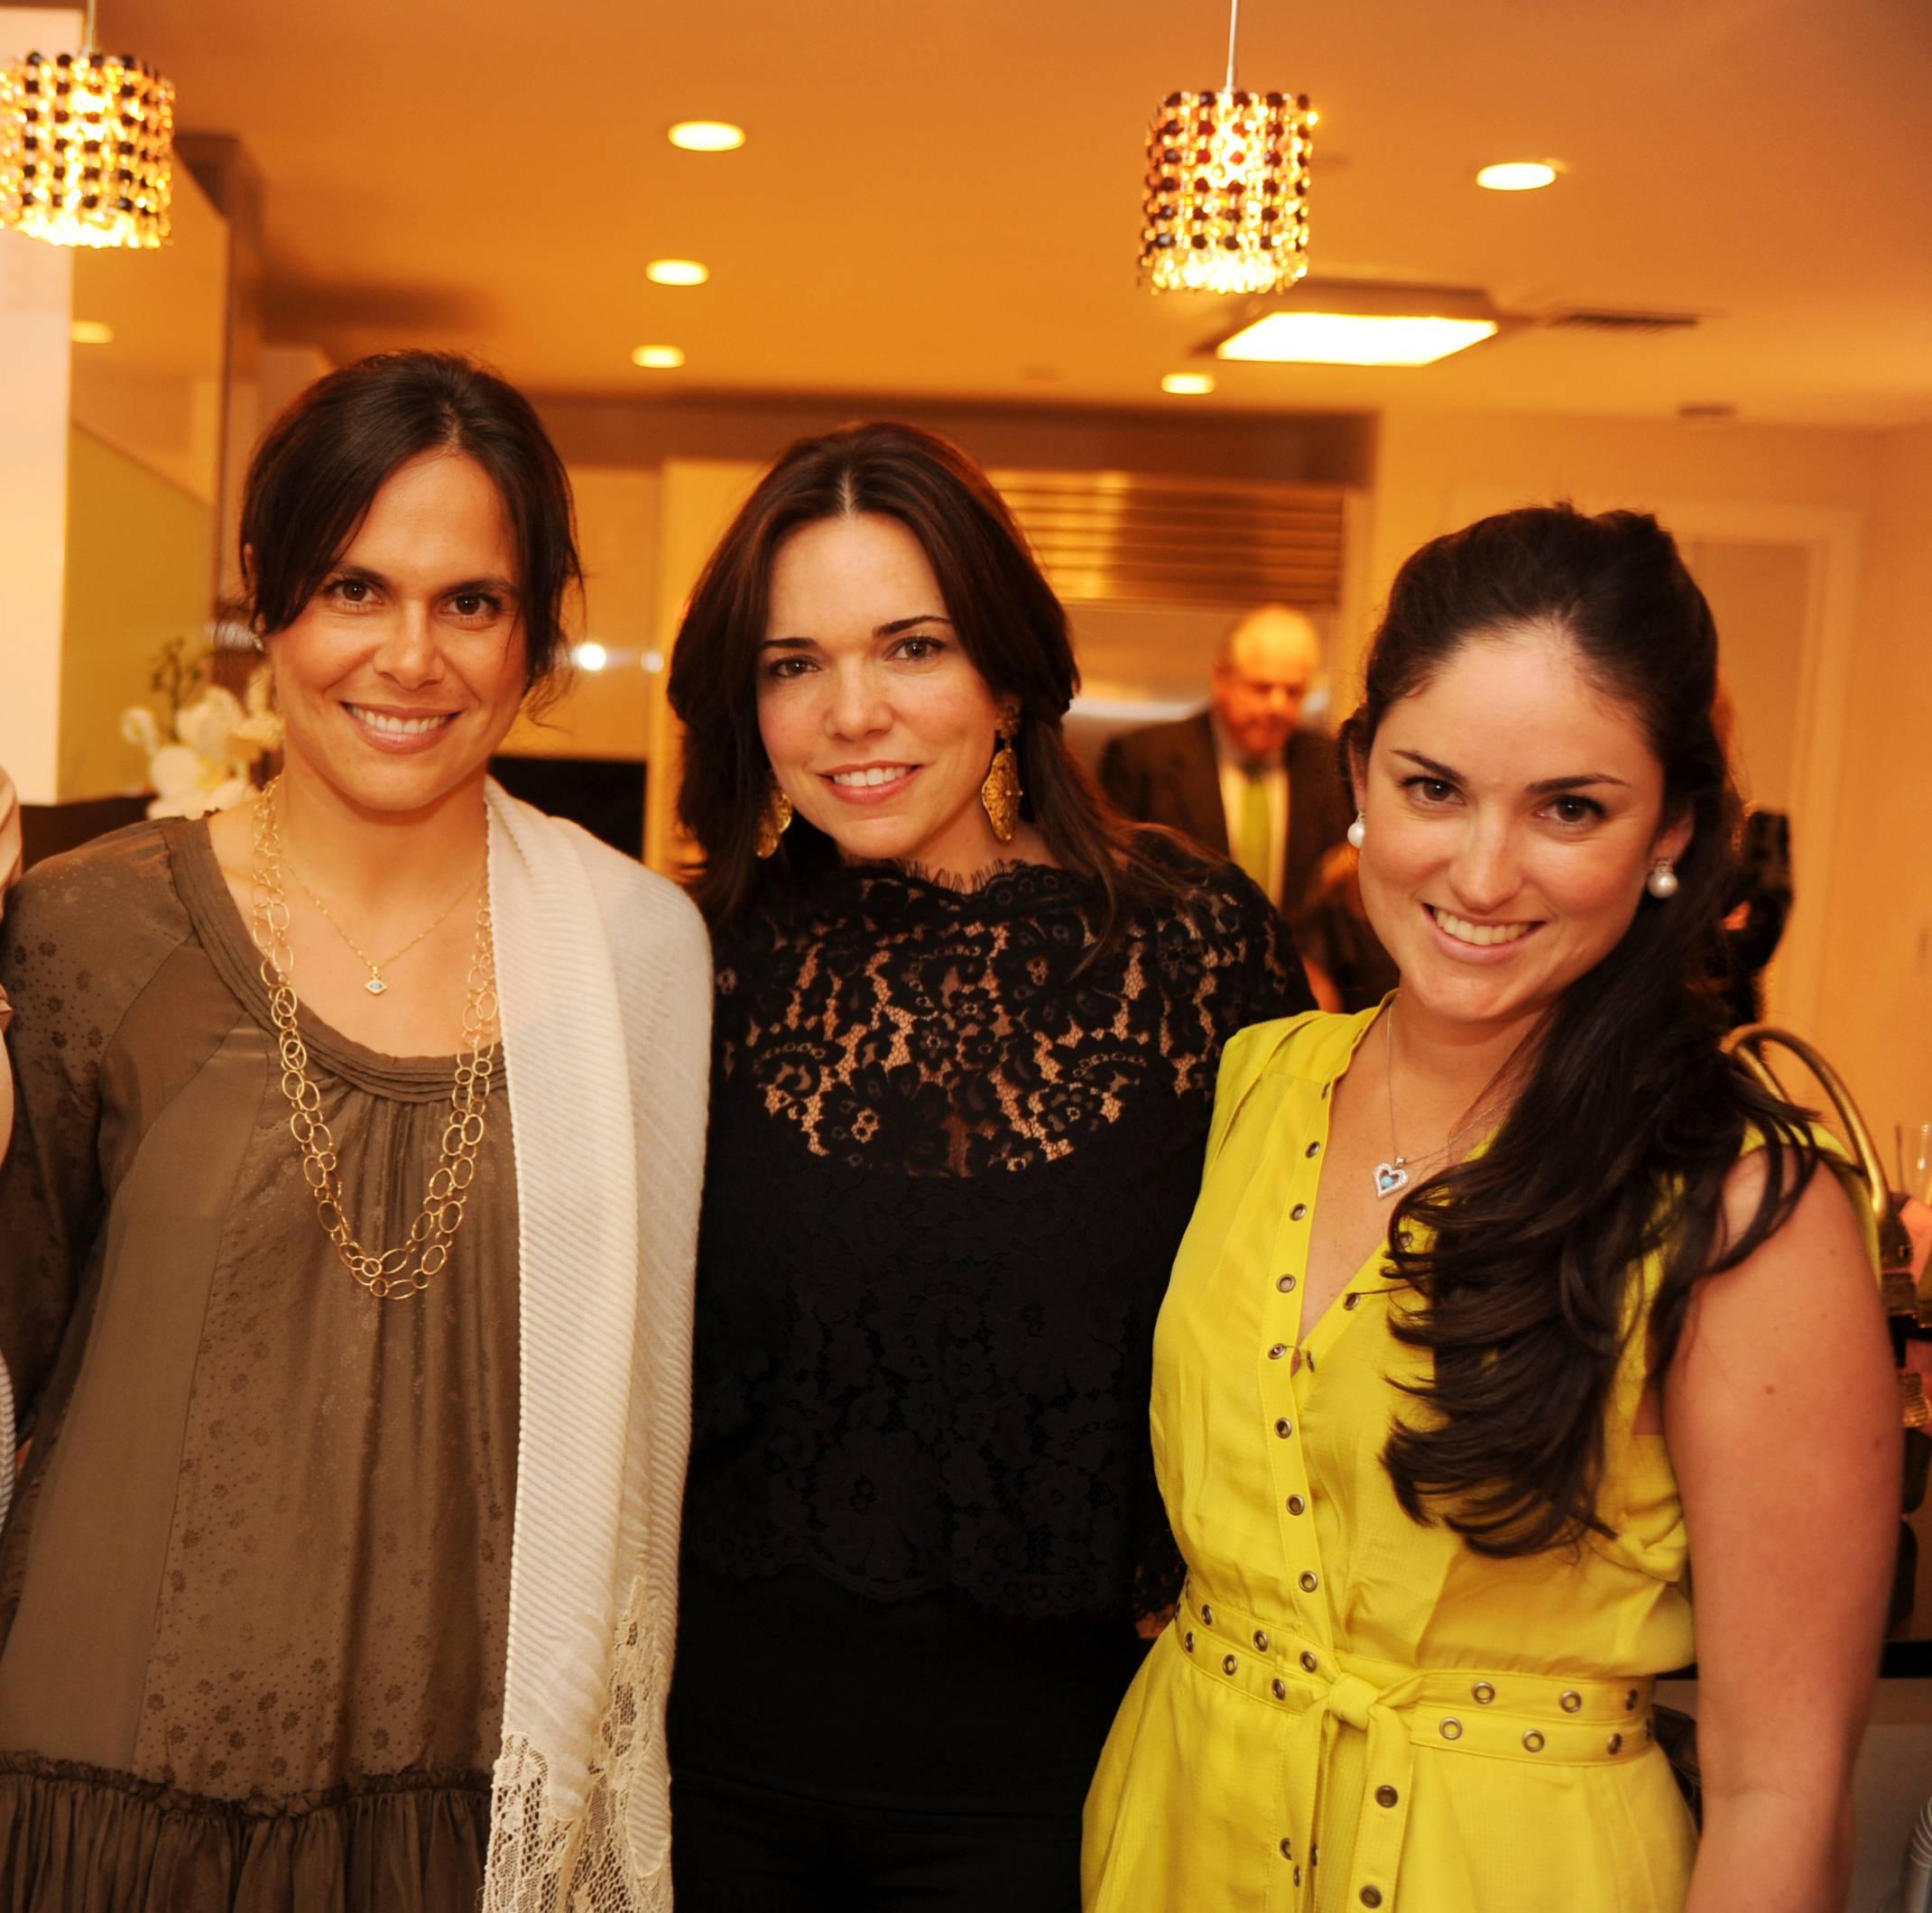 Sandra Chartouni, Nikol Solares, & Michelle Duarte3